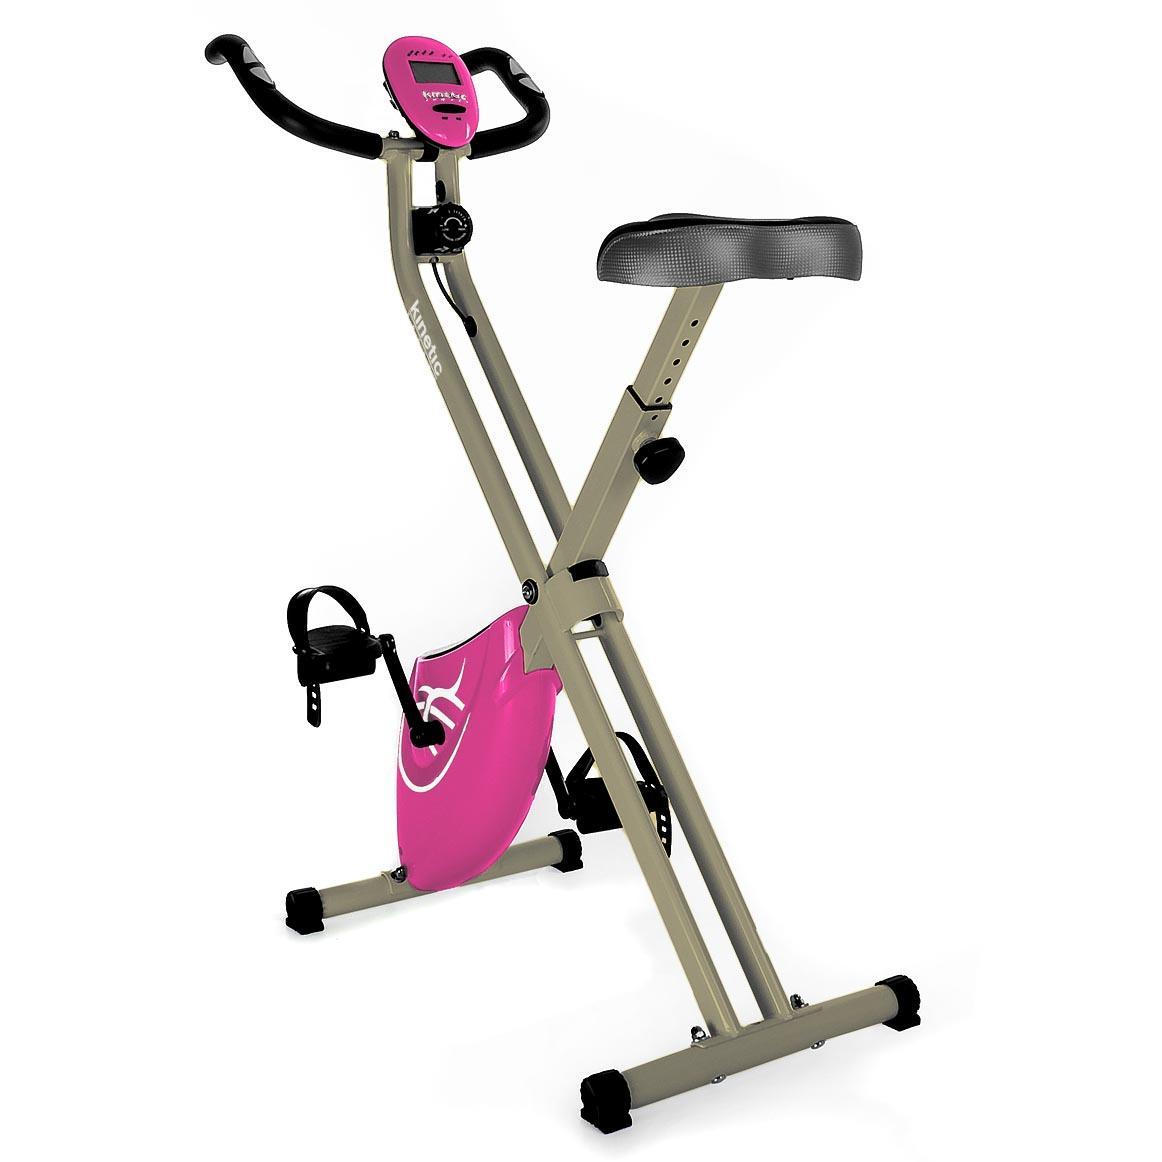 Fitnessgerät Ergometer Trimmrad Fahrrad X-Bike Cardio klappbar Heimtrainer